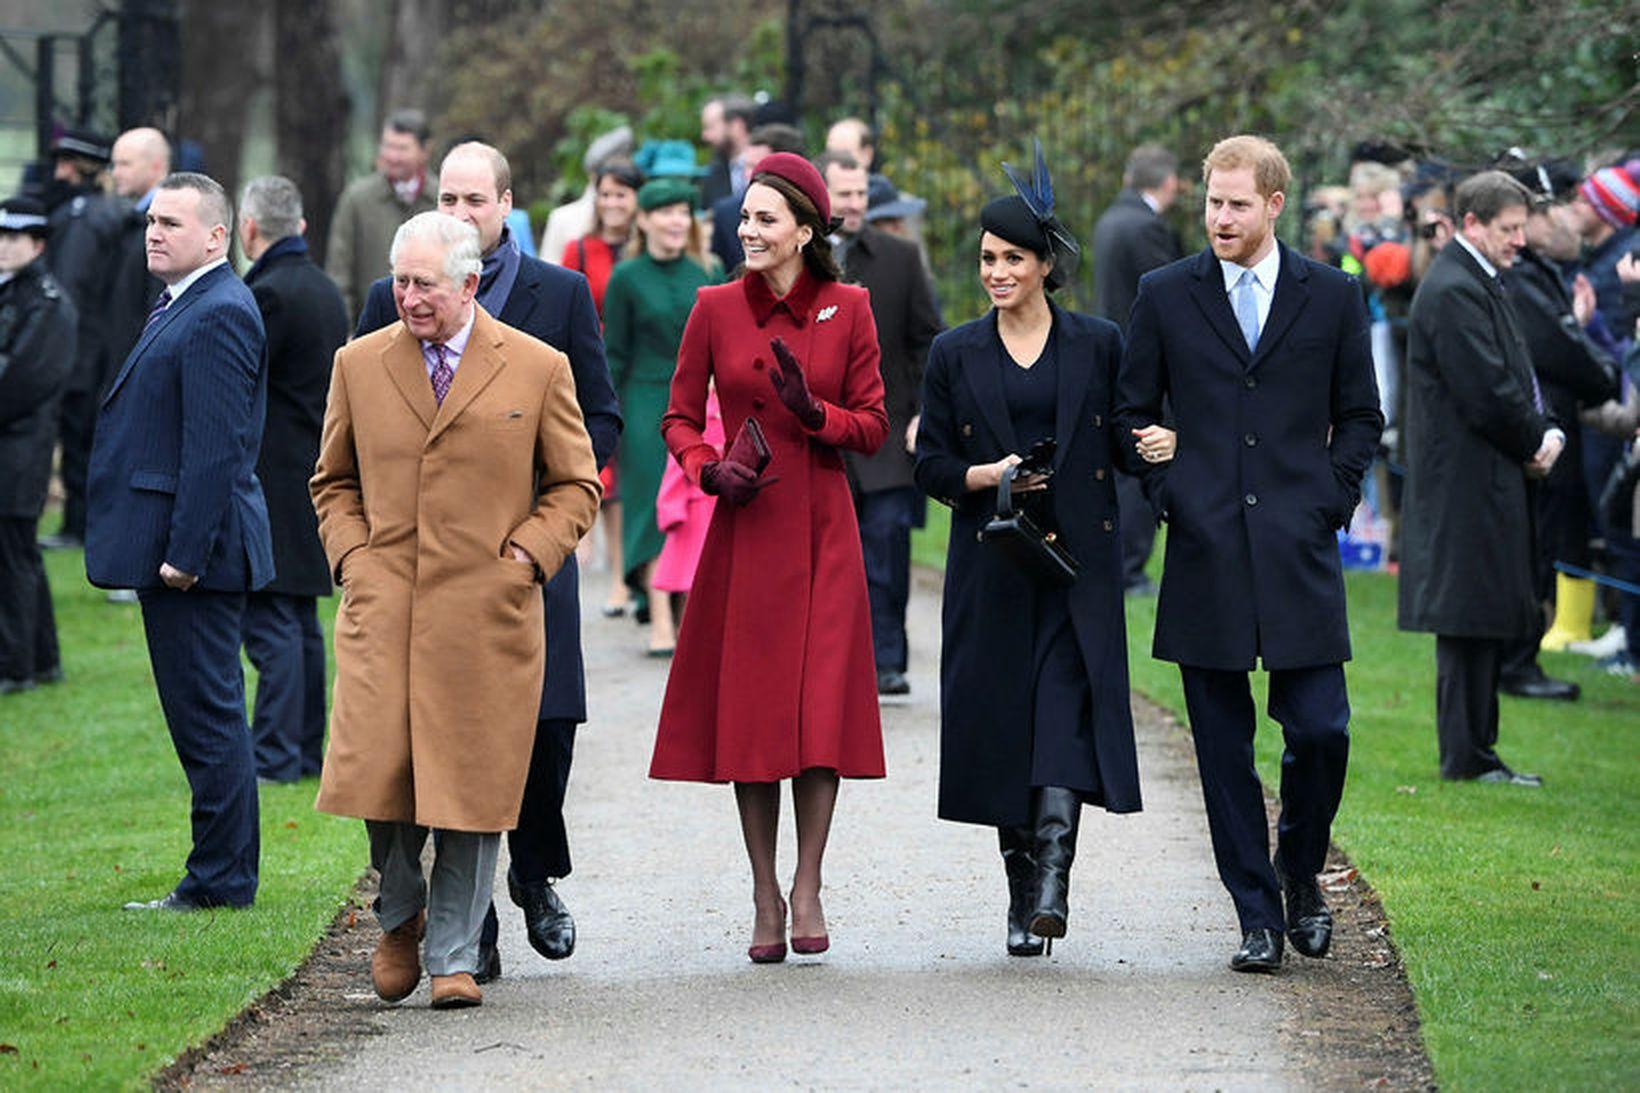 Karl Bretaprins, Katrín hertogaynja af Cambridge, Meghan hertogaynja af Sussex …